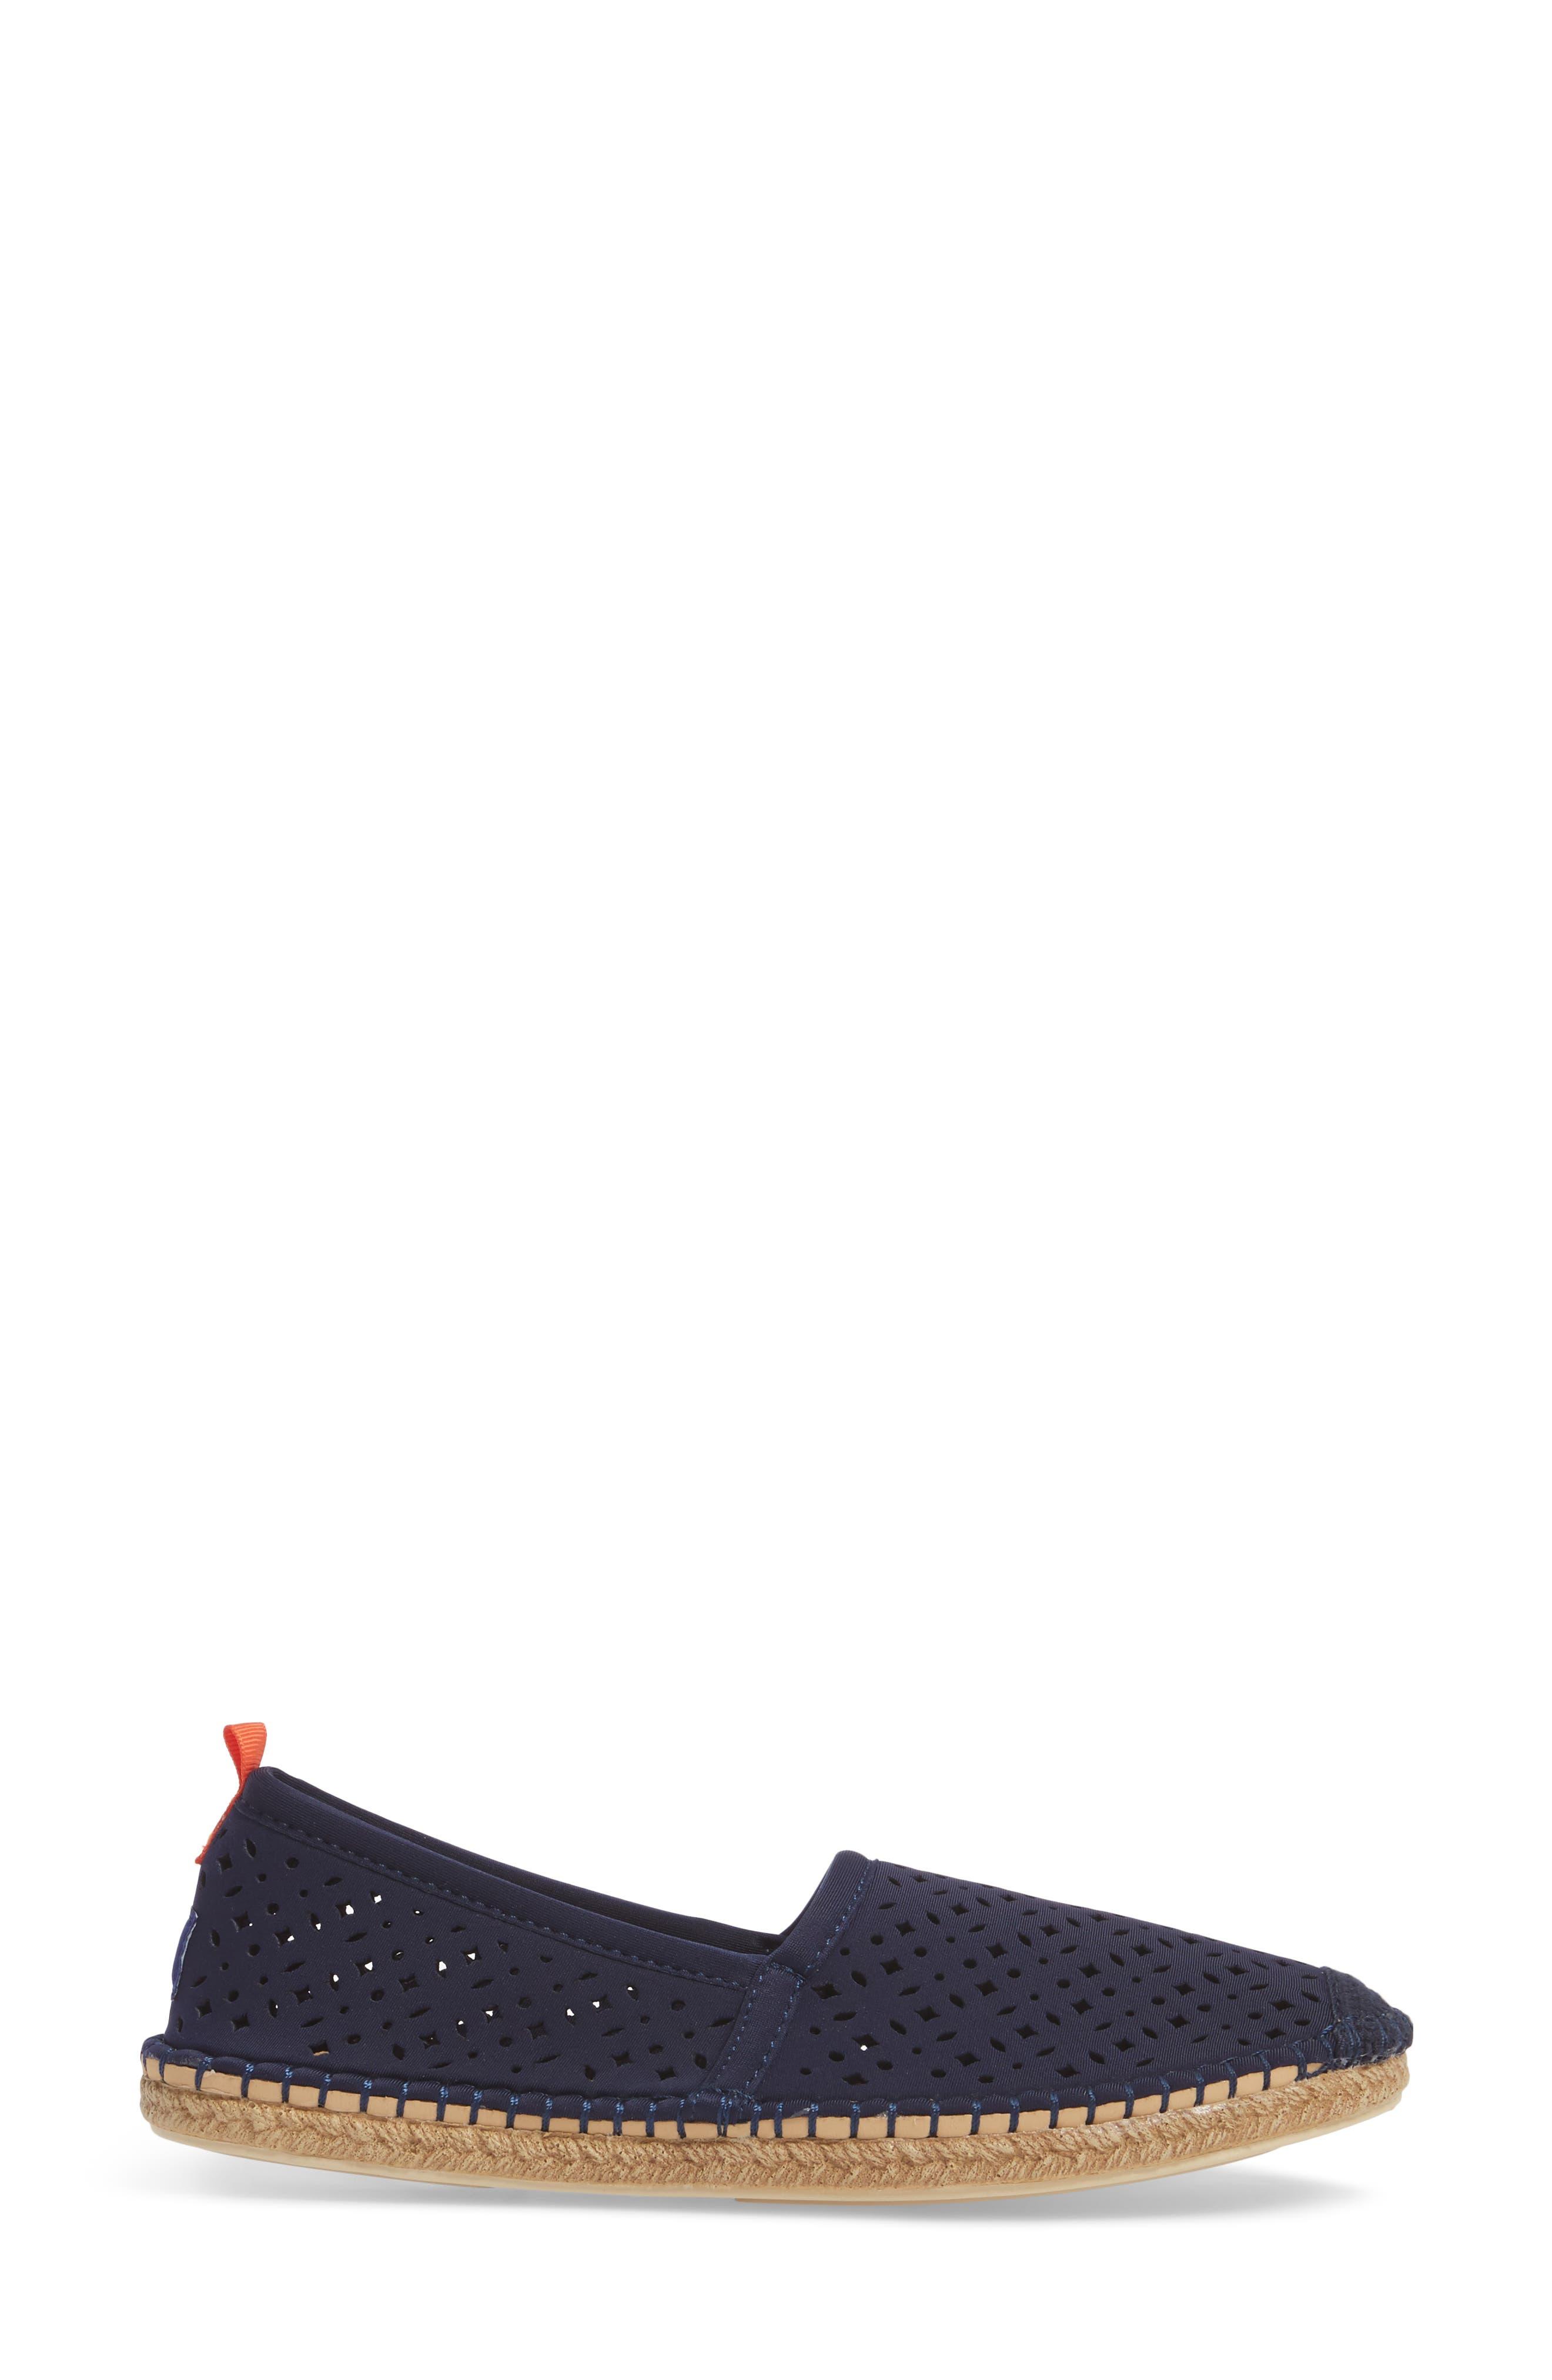 Sea Star Beachcomber Espadrille Sandal,                             Alternate thumbnail 3, color,                             Dark Navy Eyelet